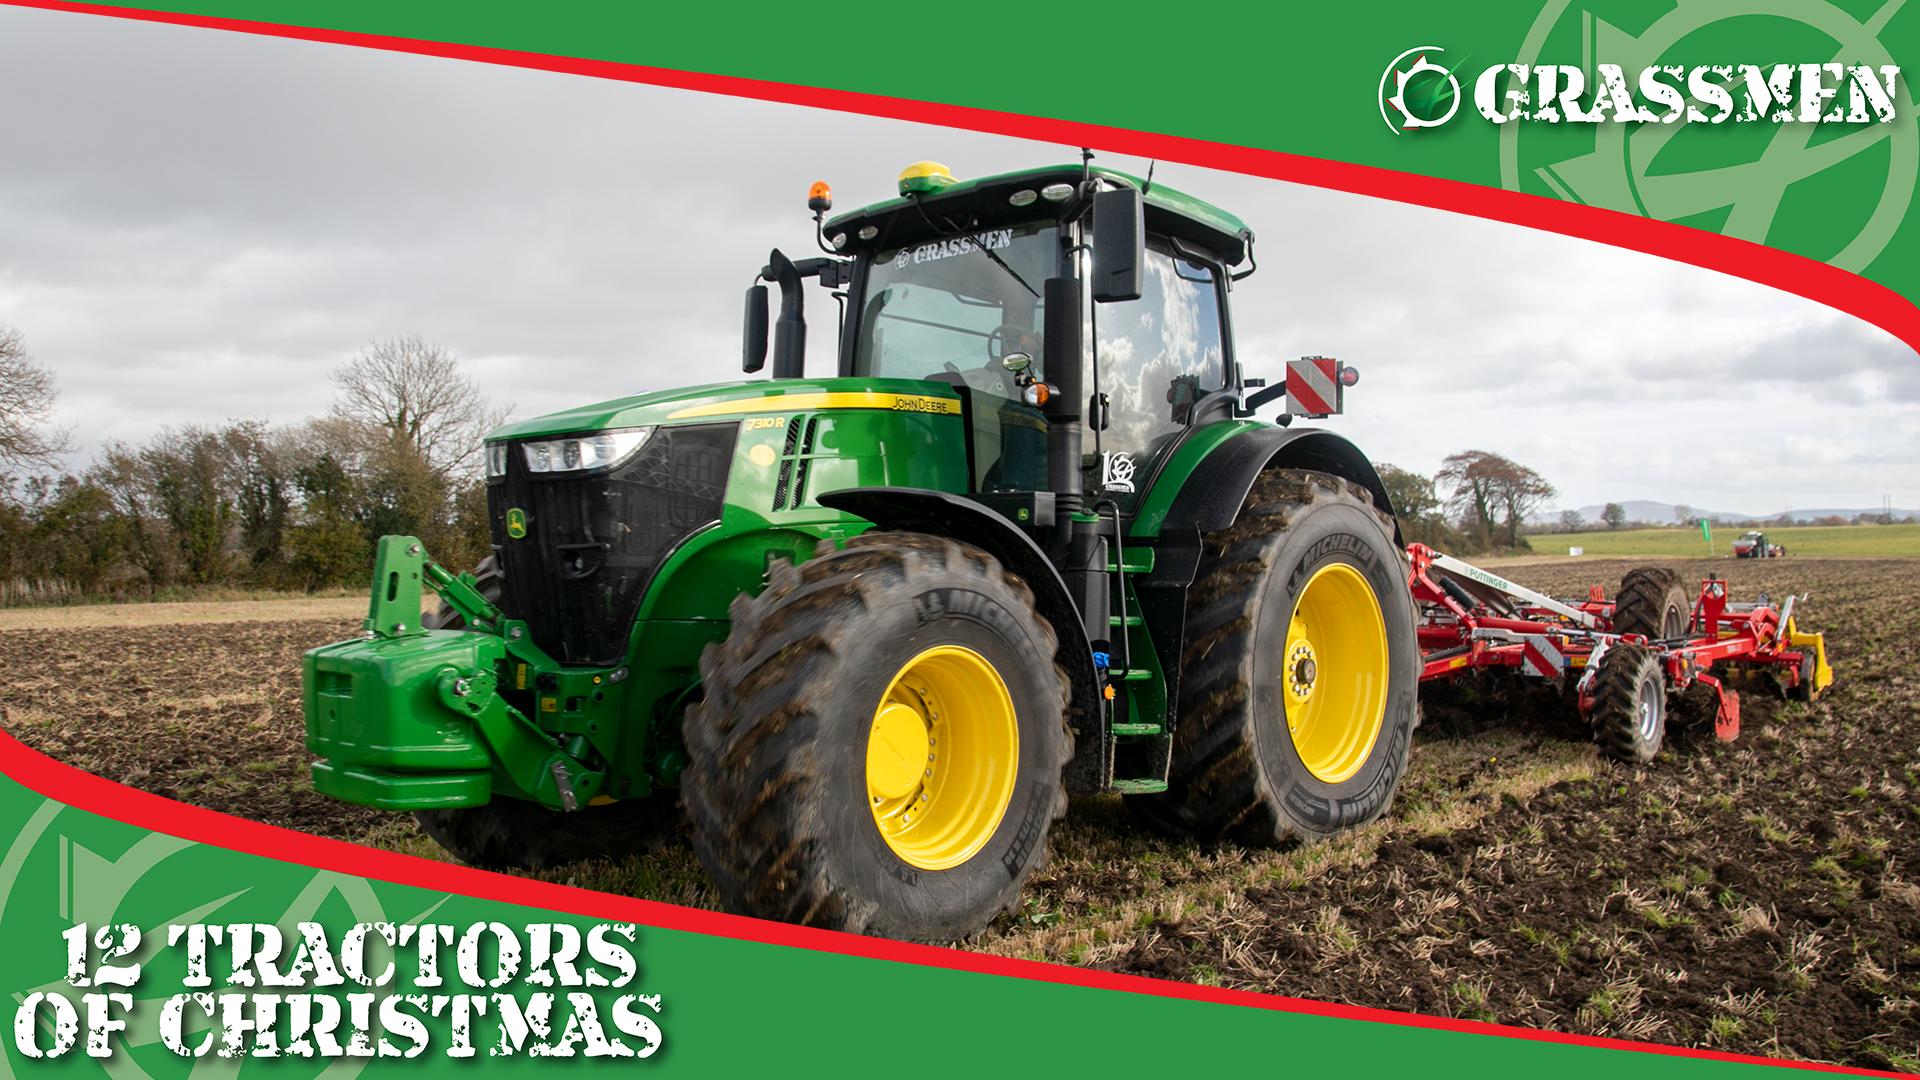 JOHN DEERE 7310R - 12 Tractors of Christmas